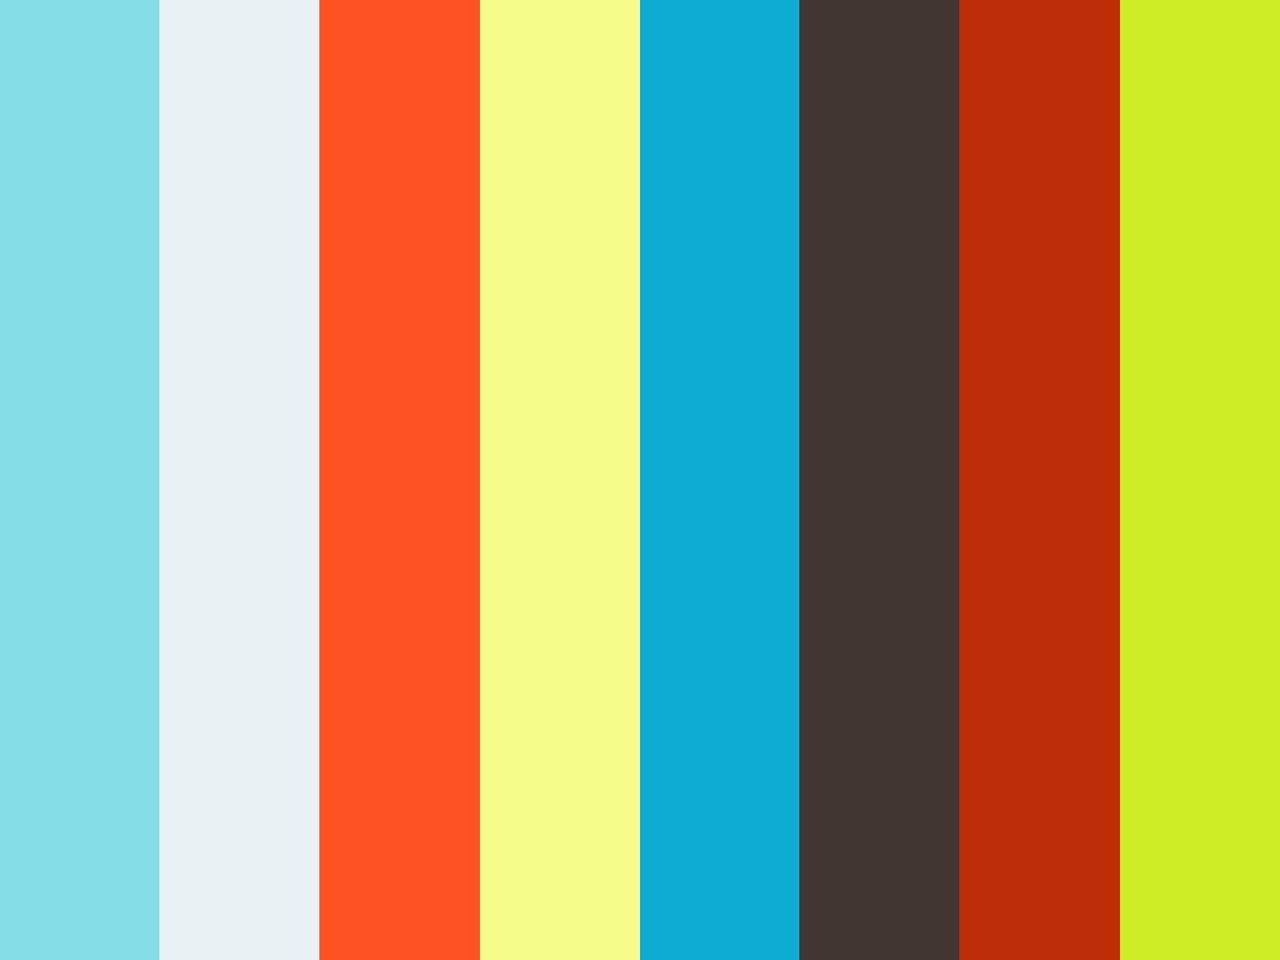 Stad Antwerpen - Tewerkstellingsprogramma Kader 20